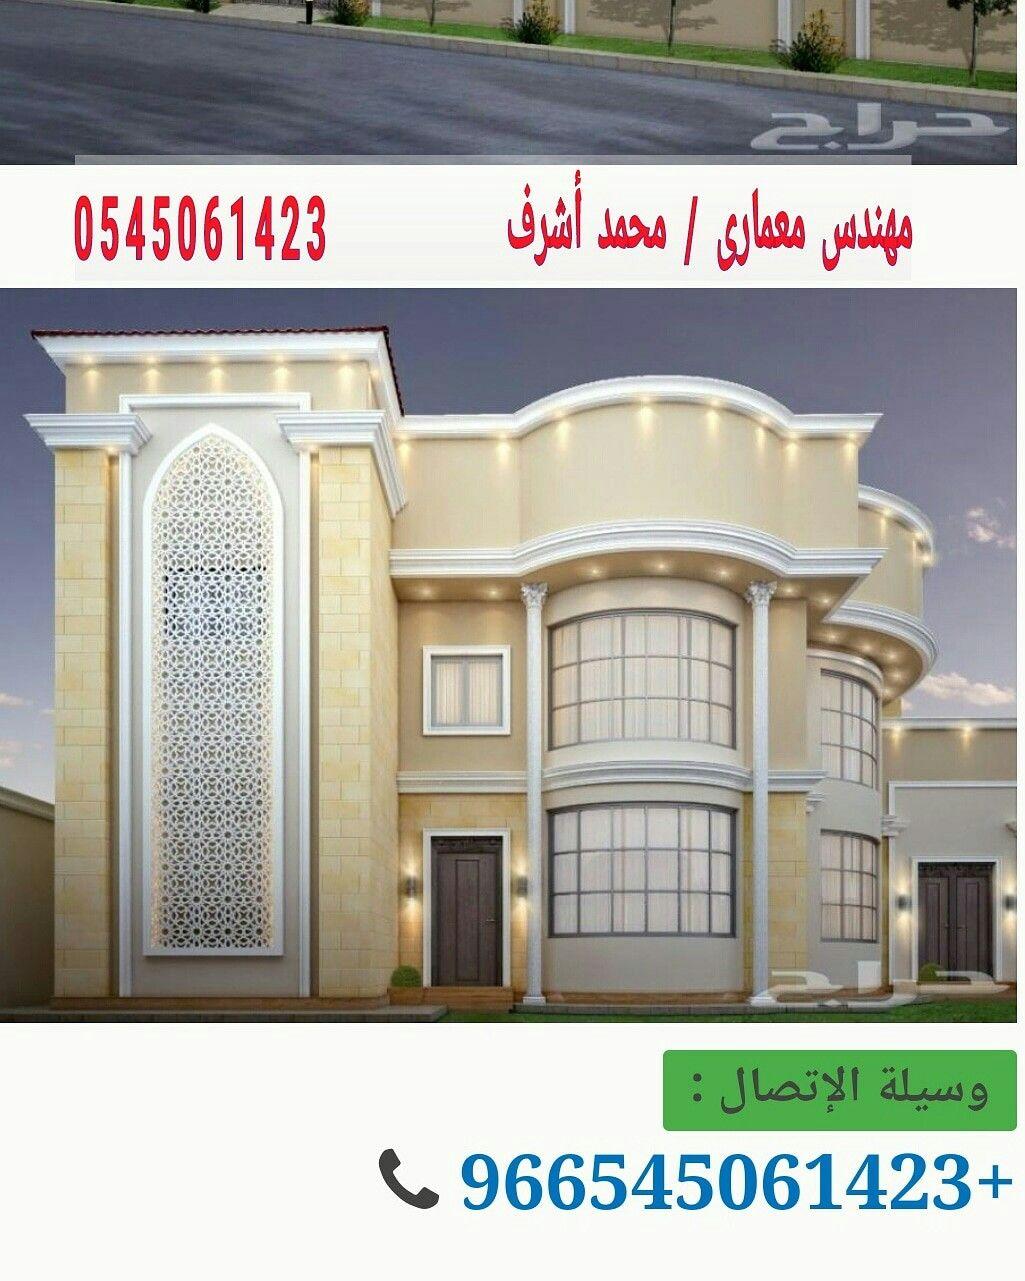 مصمم واجهات بالرياض مهندس معماري لتصاميم الفلل0545061423 مهندس معماري في الرياض مهندس تصاميم قصور في الرياض Modern Houses Interior House Design Modern House